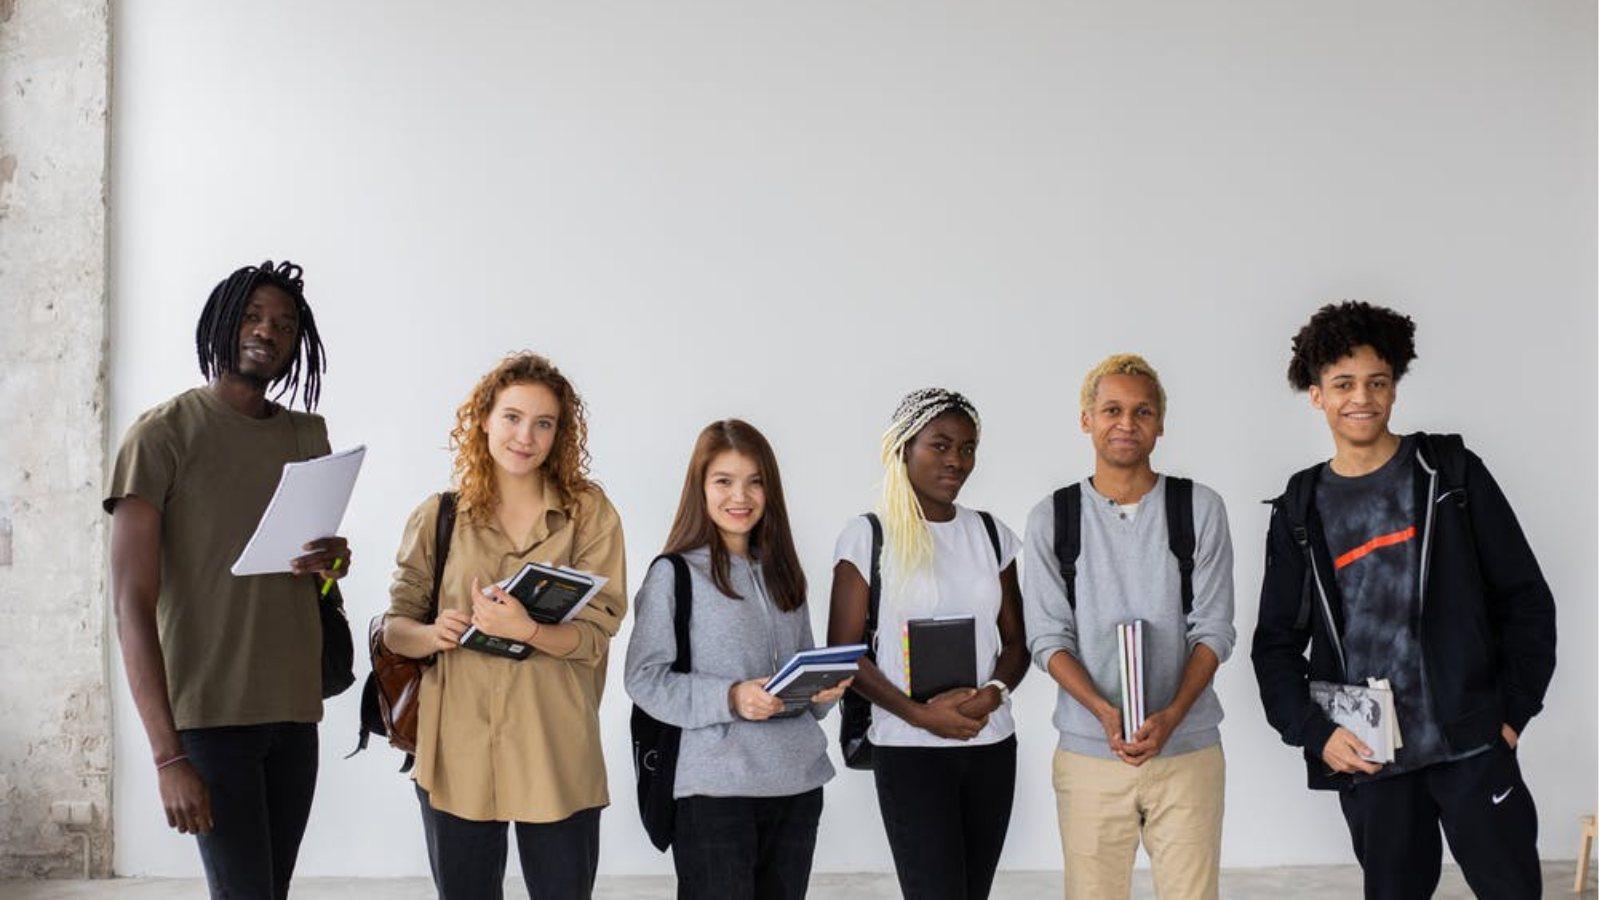 6 factors influencing overseas students when choosing a university